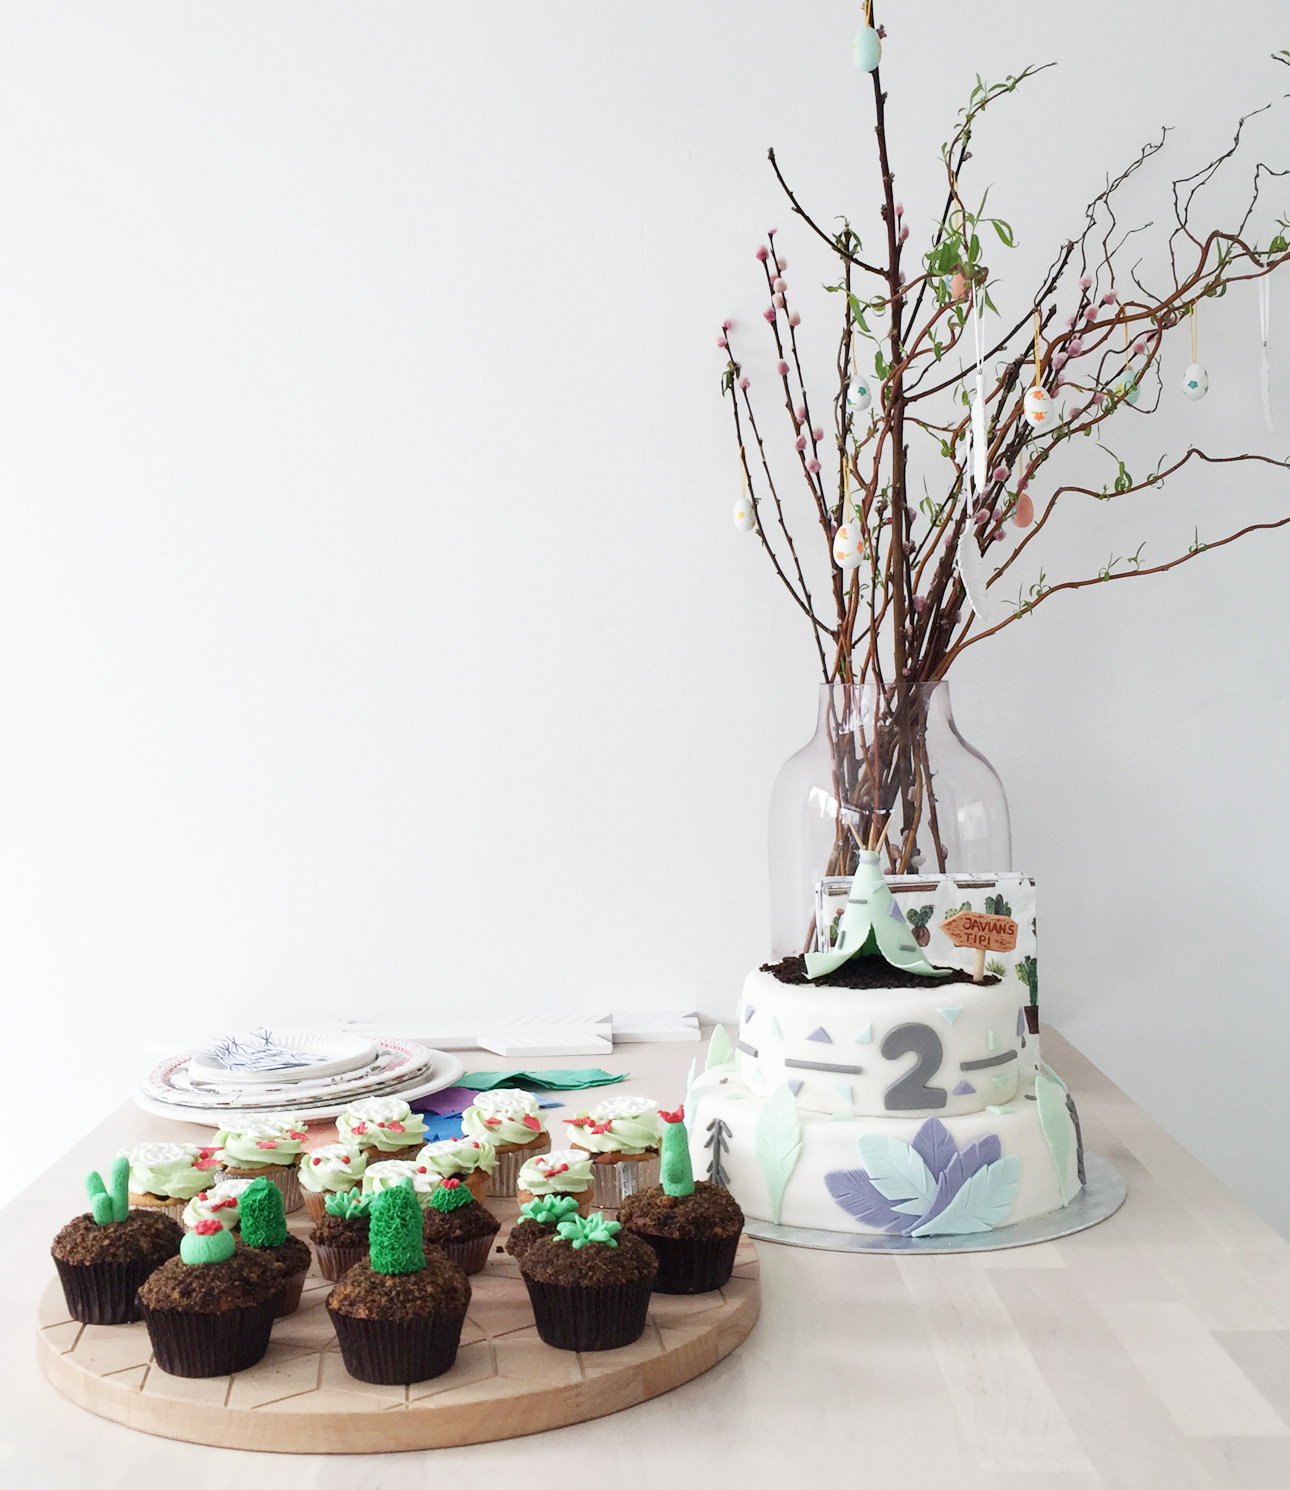 Indianen kinderfeestje pastel taart cupcakes